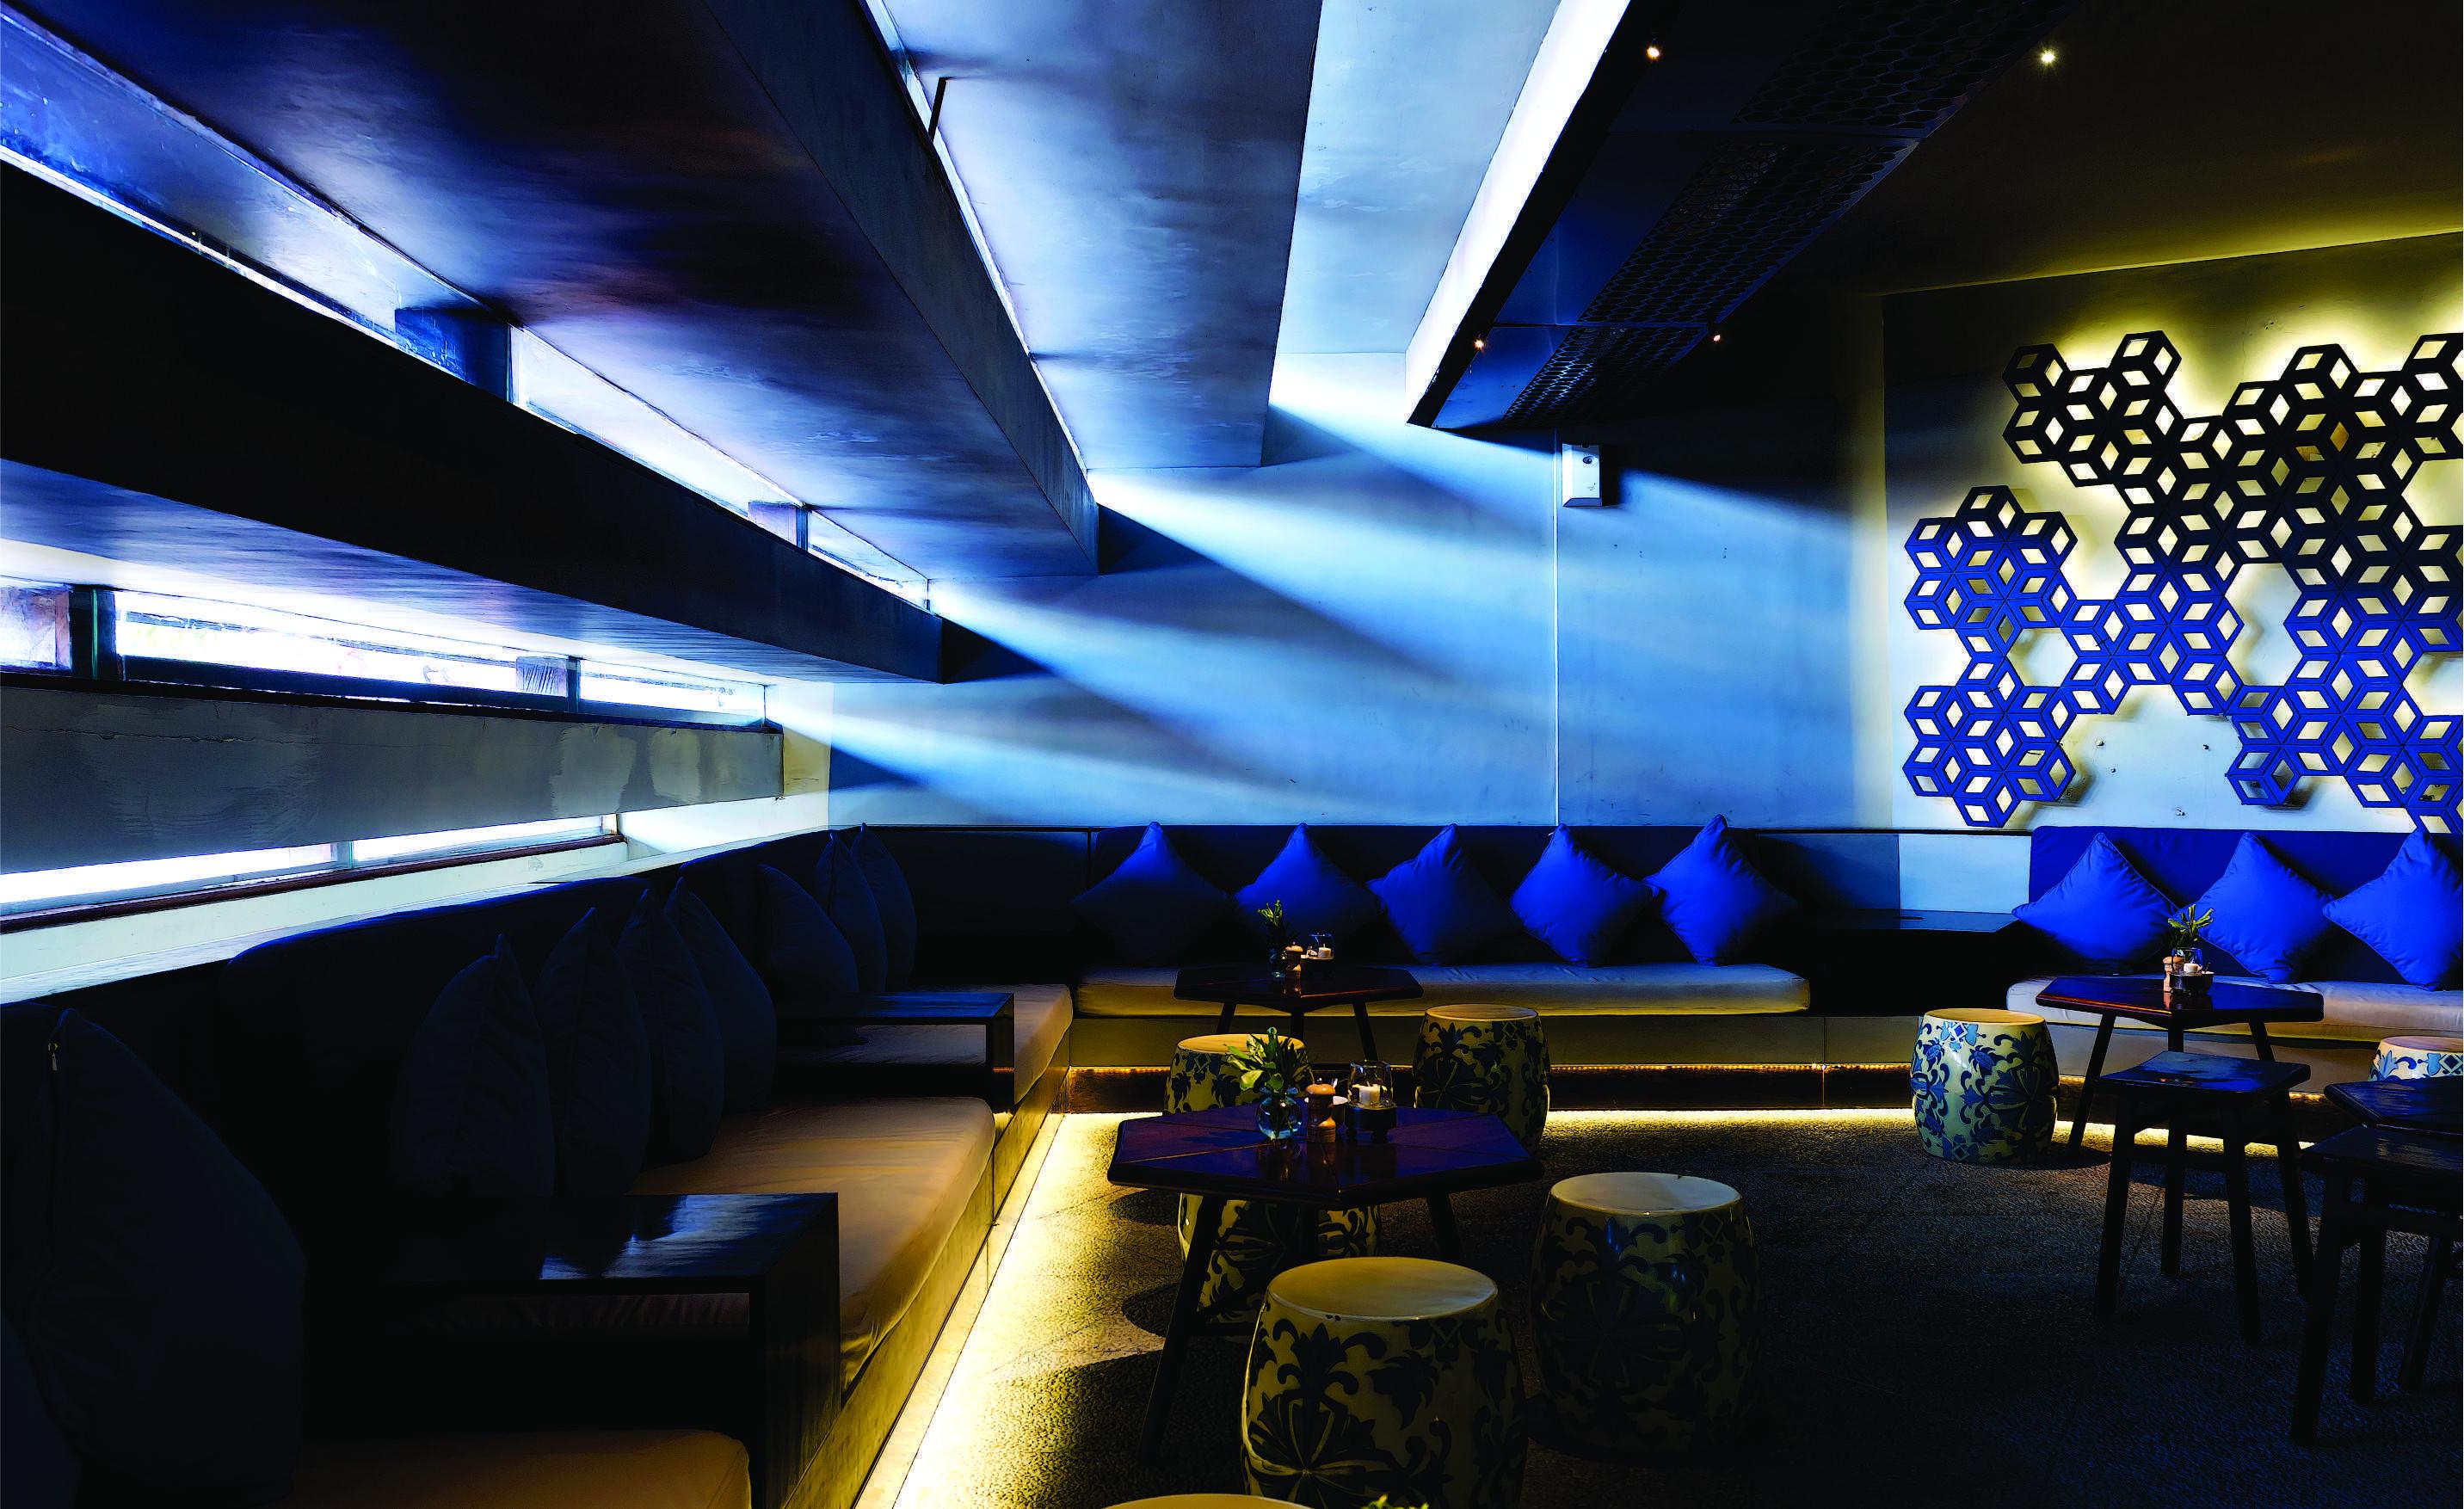 Mint-Ds Char Char Bar And Grill Jl. Kayu Aya, Seminyak, Bali Jl. Kayu Aya, Seminyak, Bali Bar Lounge   16169